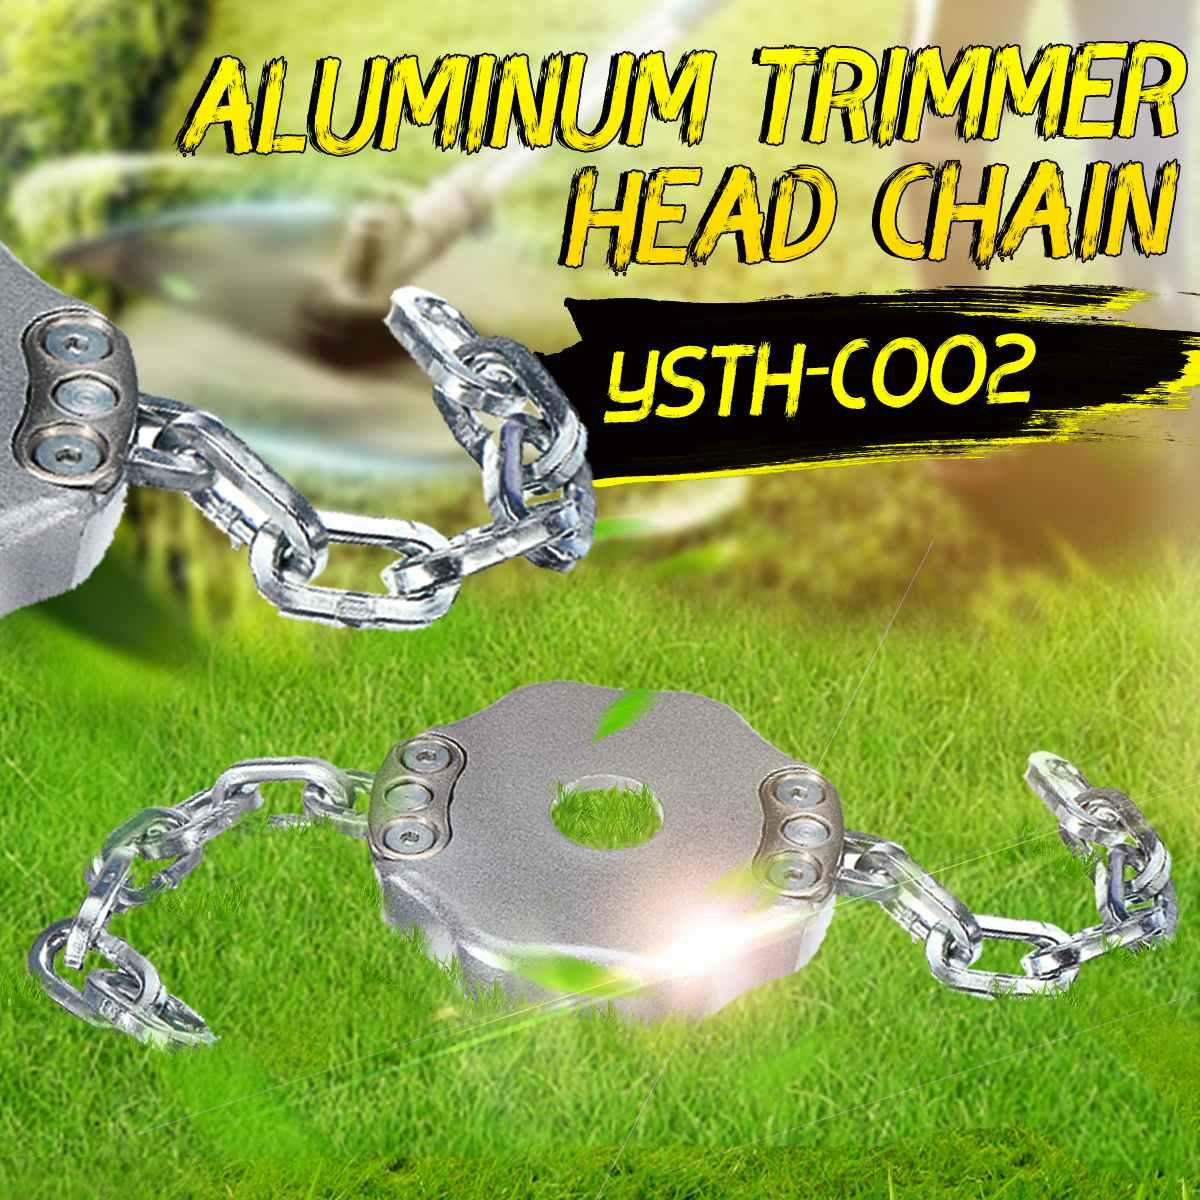 Universal Trimmer Head Aluminum Lawn Mower Parts Outdoor Coil Chain Grass Weeds Cutter Garden Grass Trimmer Tools Replacement